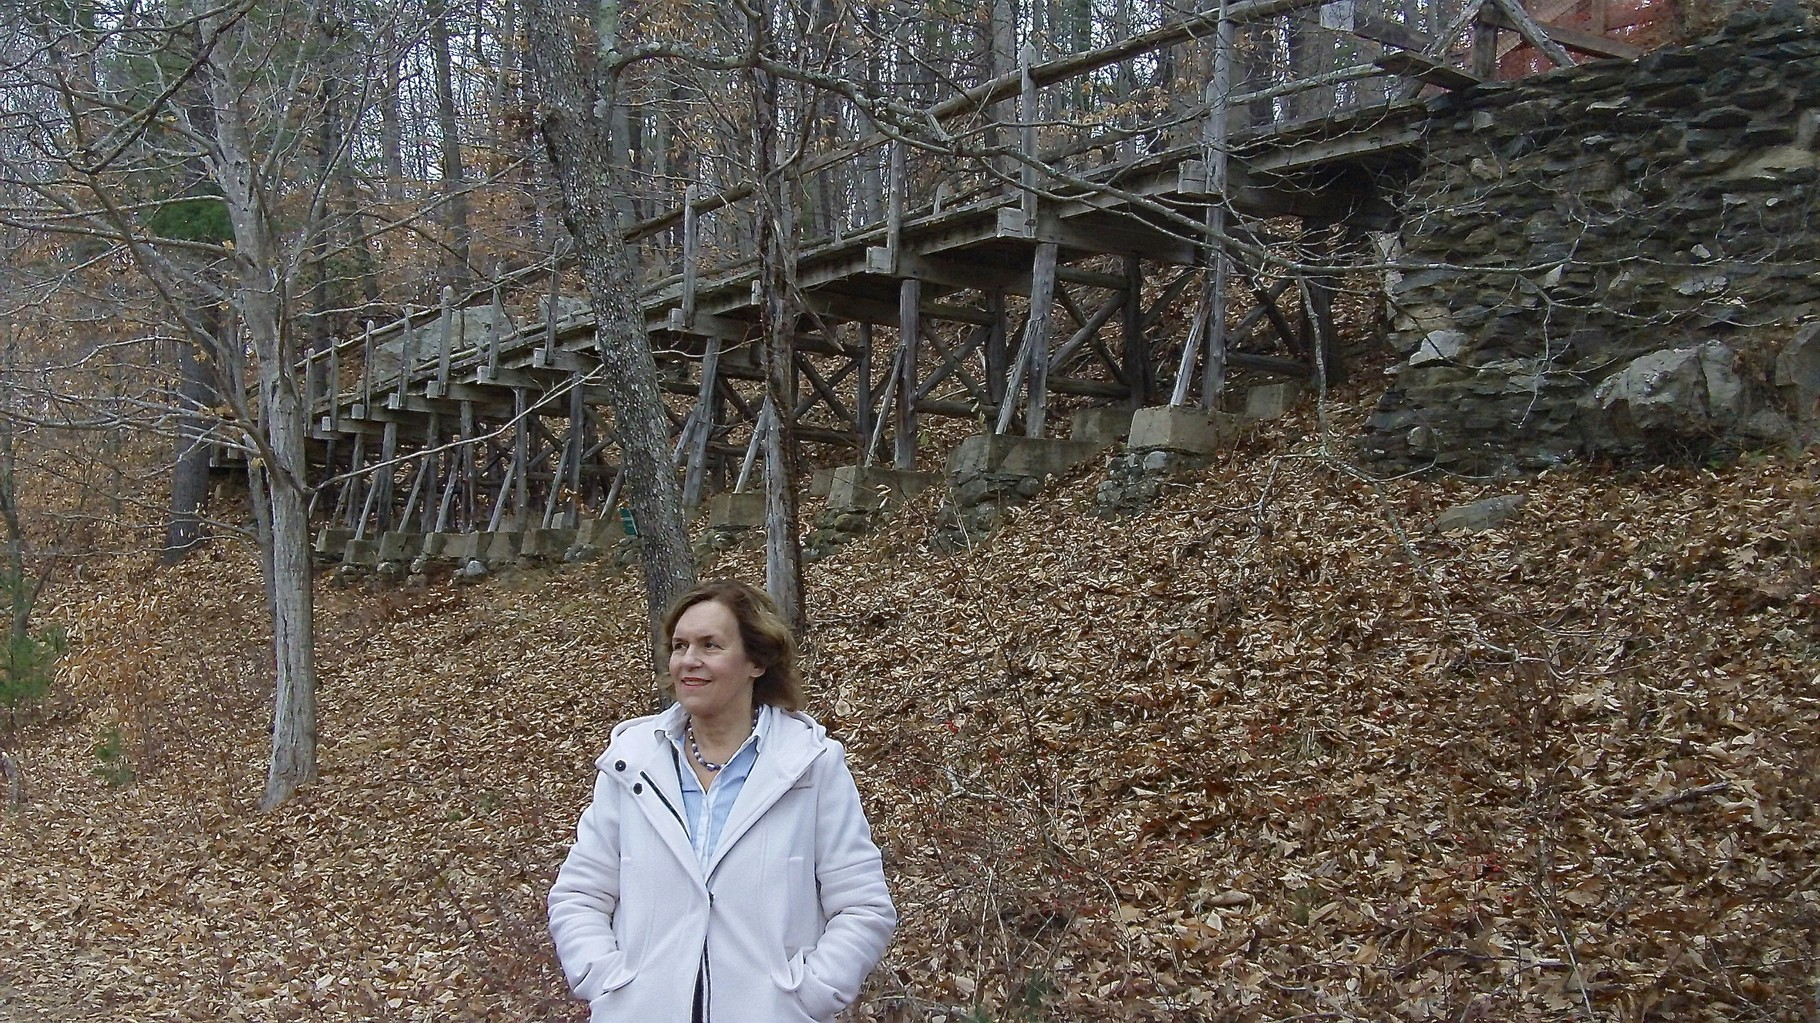 Lorraine, Gillette Castle State Park